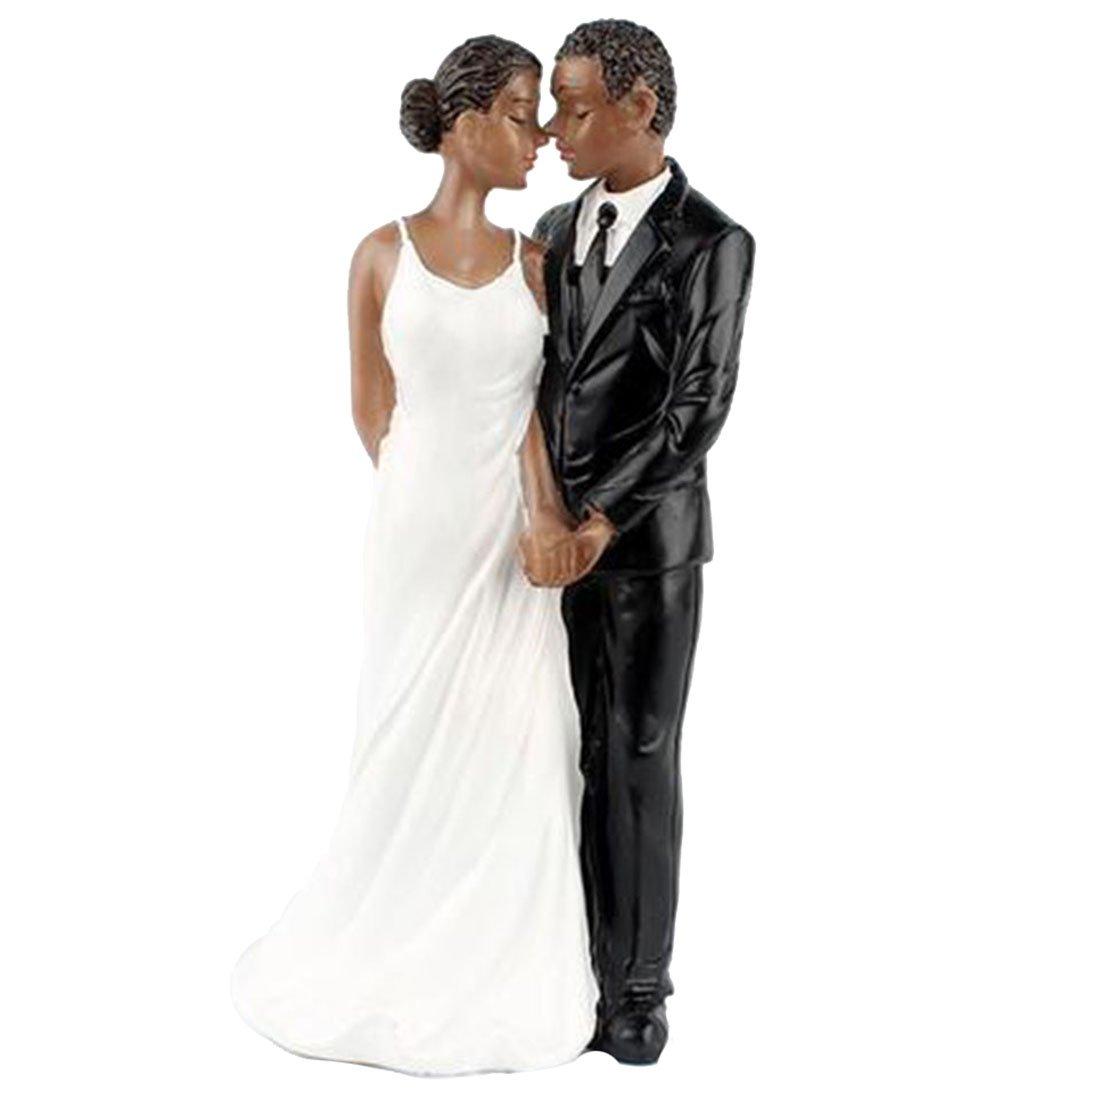 1e2dfc504e Amazon.com: Little Chair Resin Wedding Cake Topper African American ...